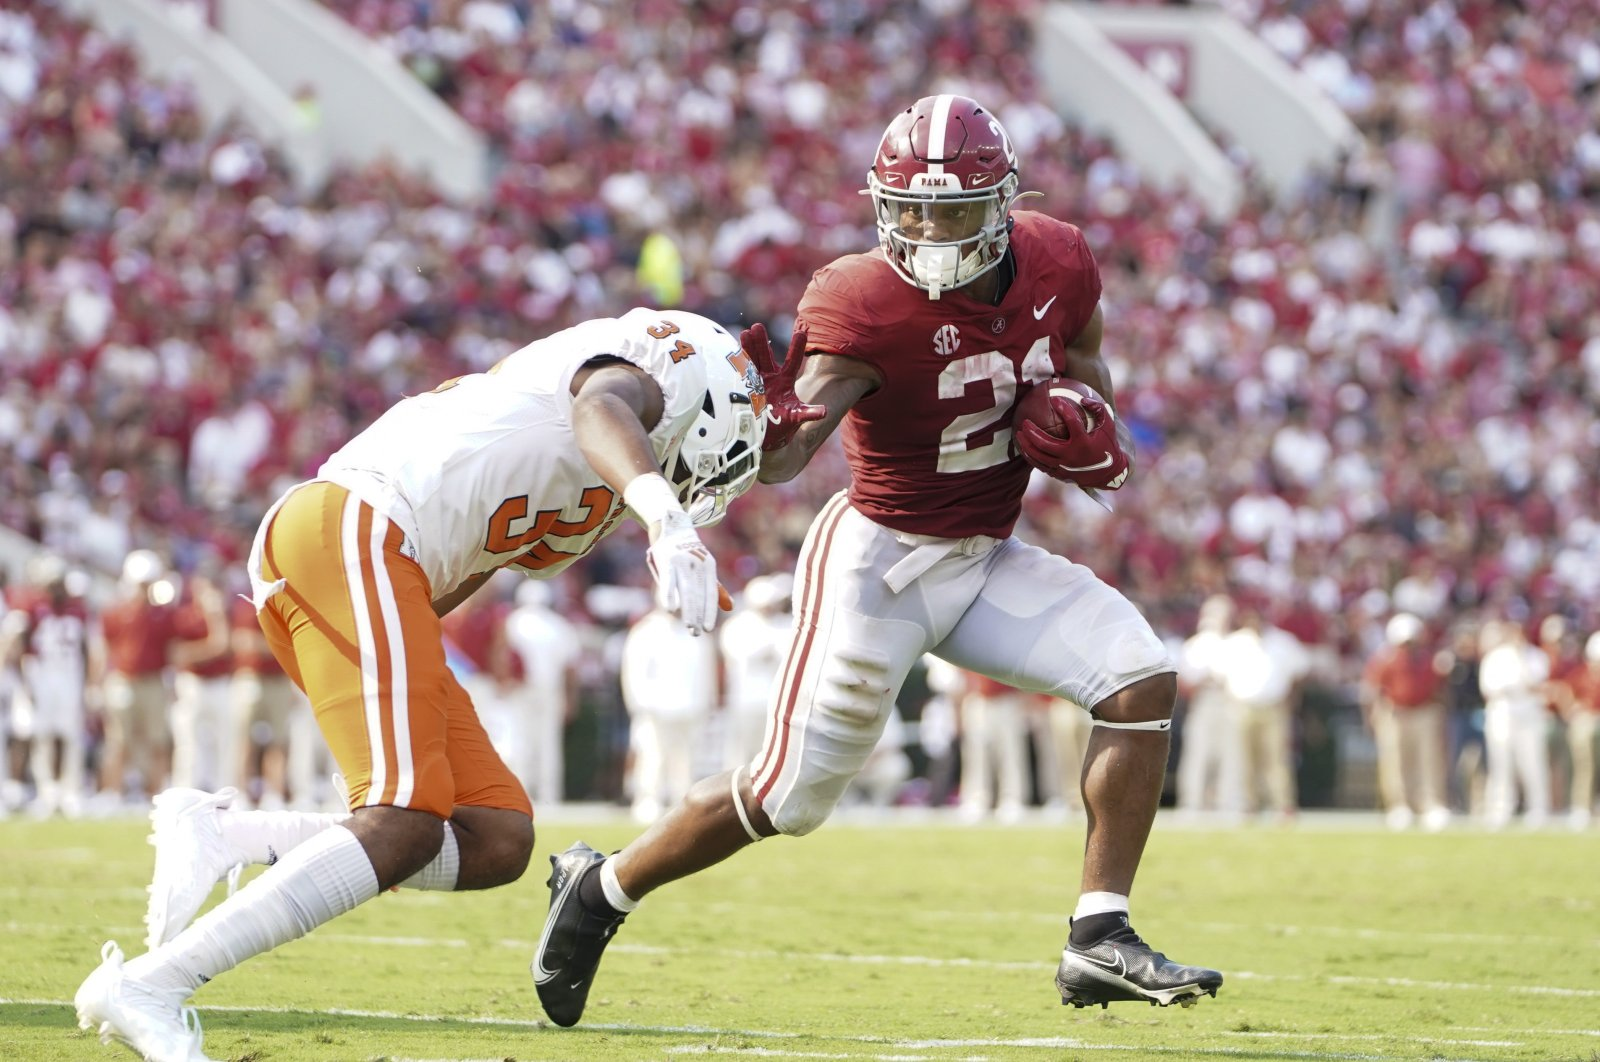 Alabama Crimson Tide running back Jase McClellan (21) pushes away Mercer Bears safety Myles Redding (34) at Bryant-Denny Stadium,Tuscaloosa, Alabama, U.S., Sept. 11, 2021. (Marvin Gentry-USA TODAY Sports via Reuters)